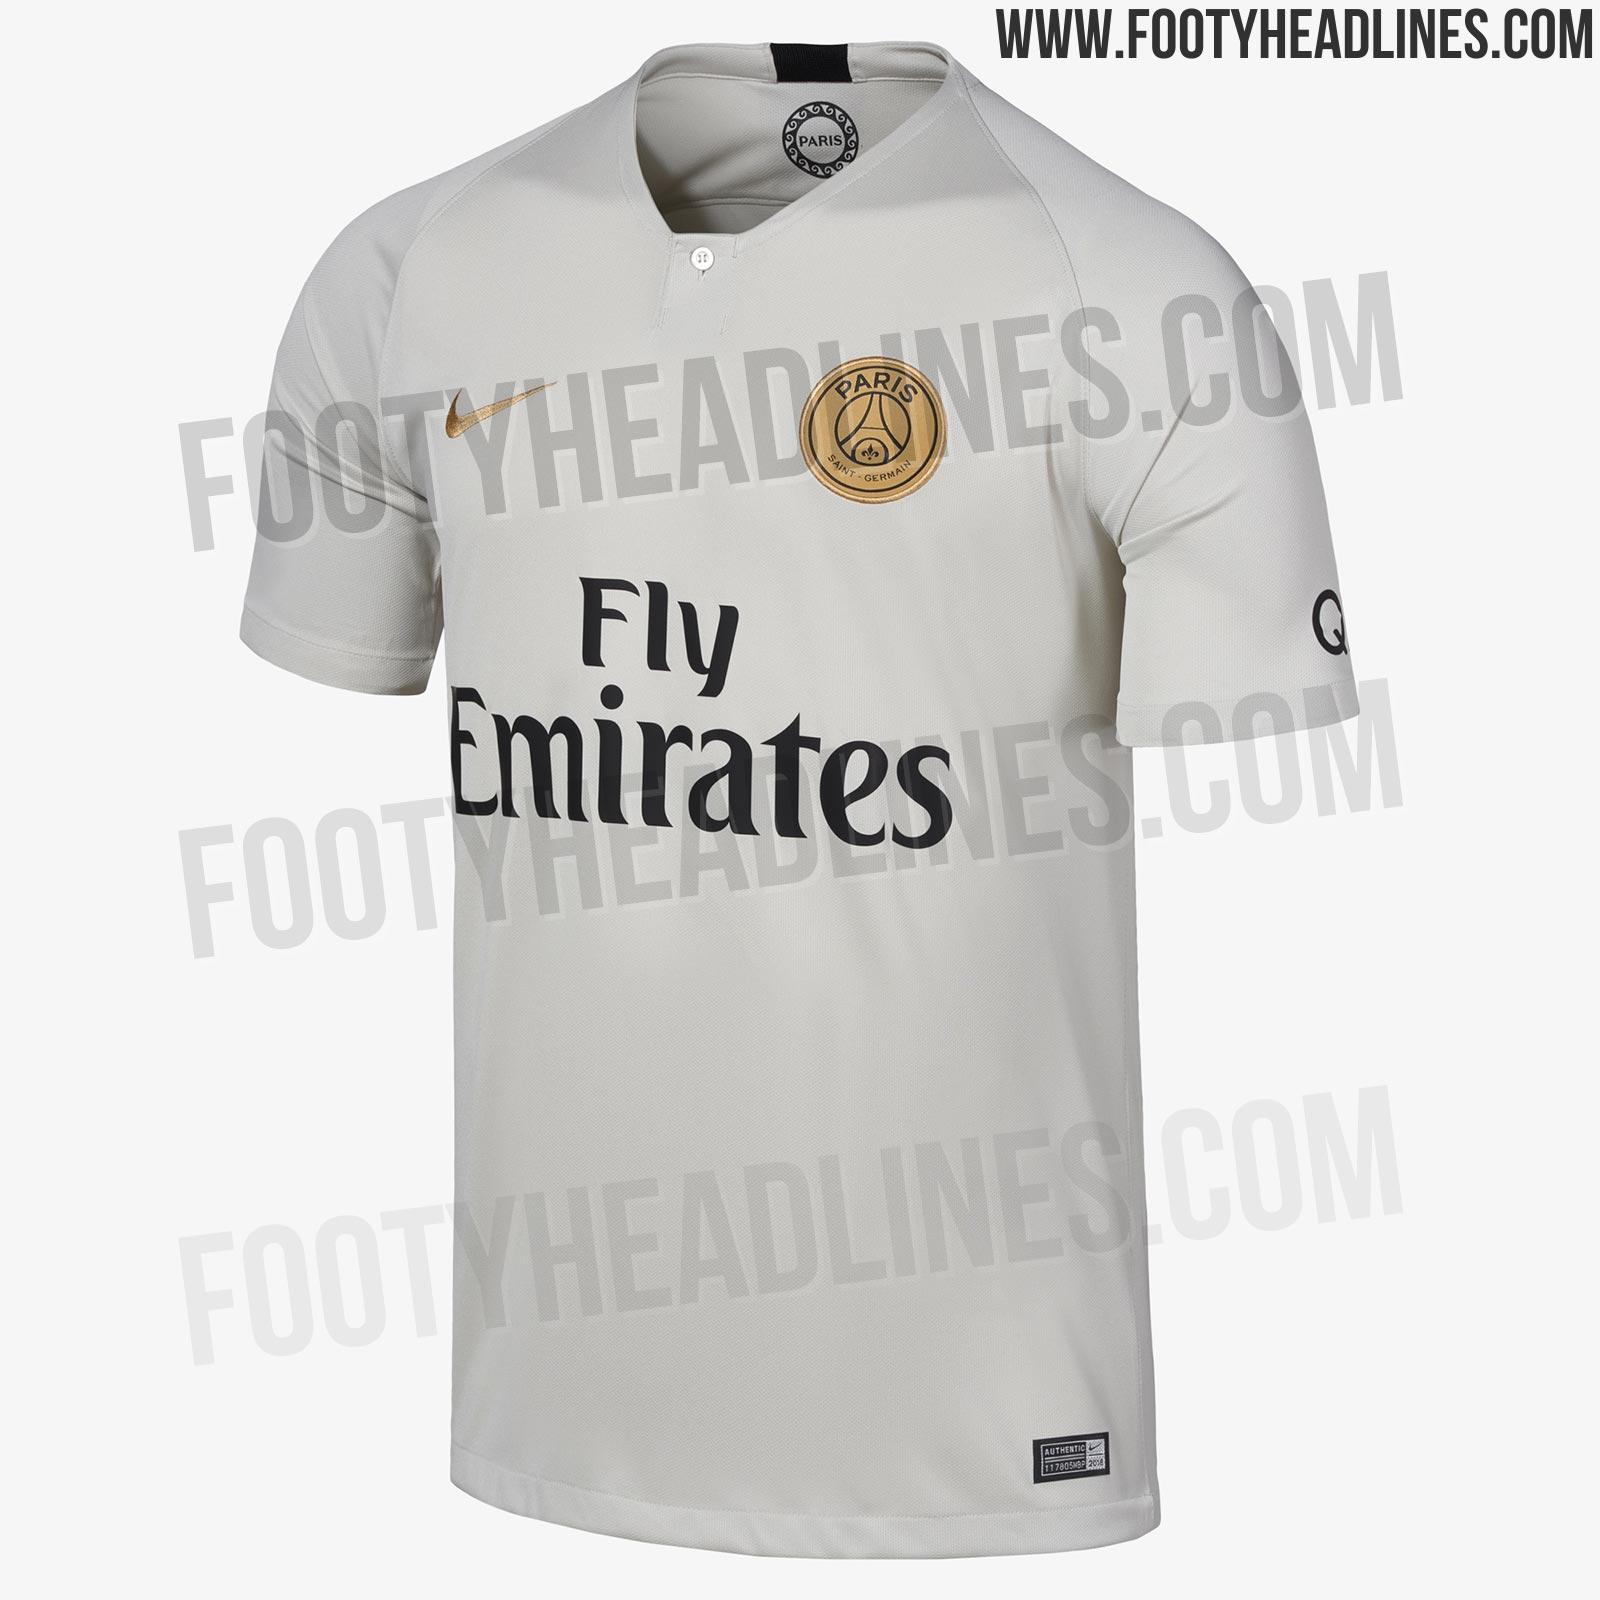 40259dc74 OFFICIAL Pictures  Paris Saint-Germain 18-19 Away Kit Leaked ...